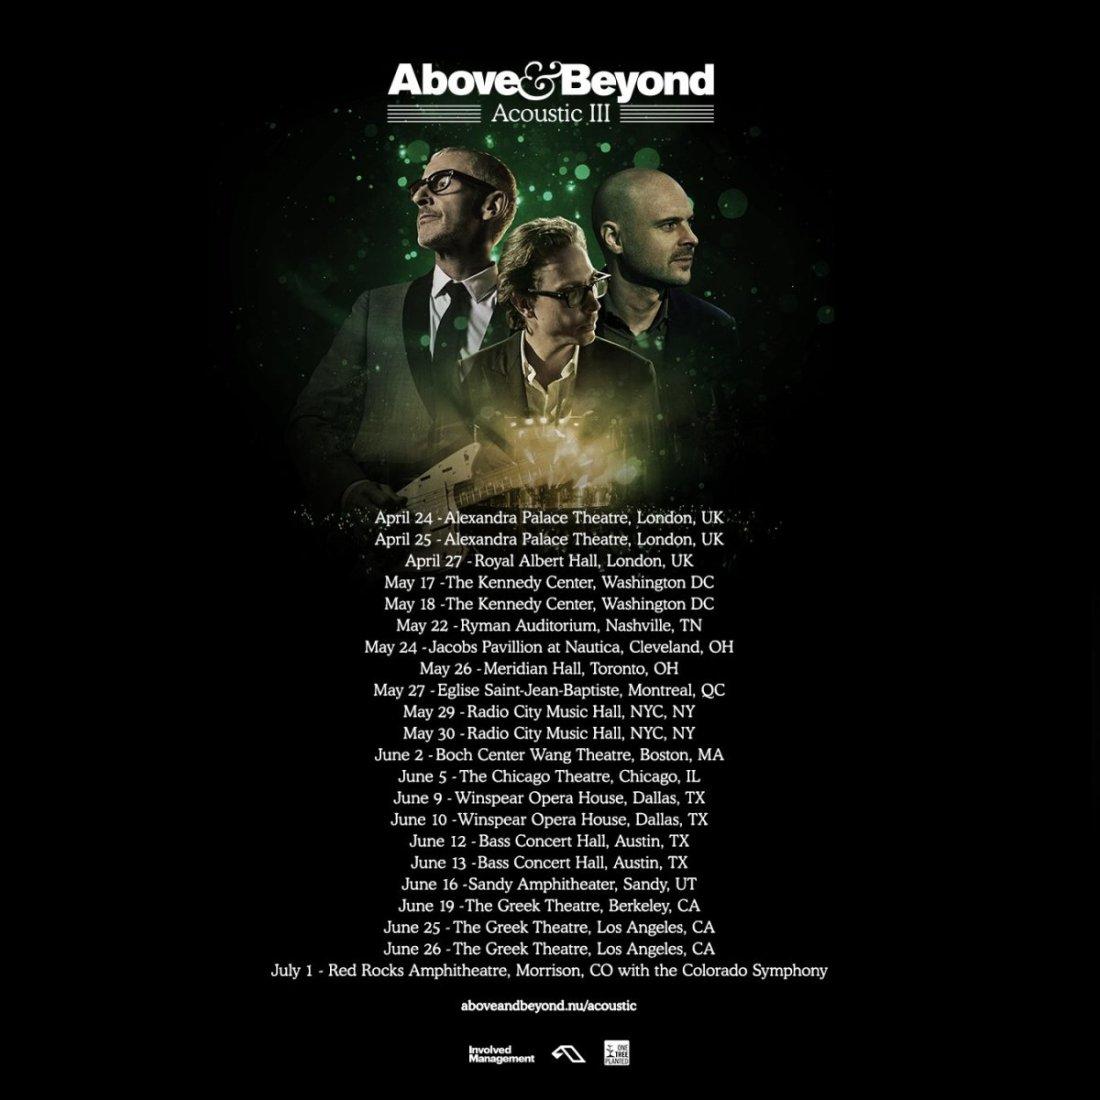 Above & Beyond Acoustic III